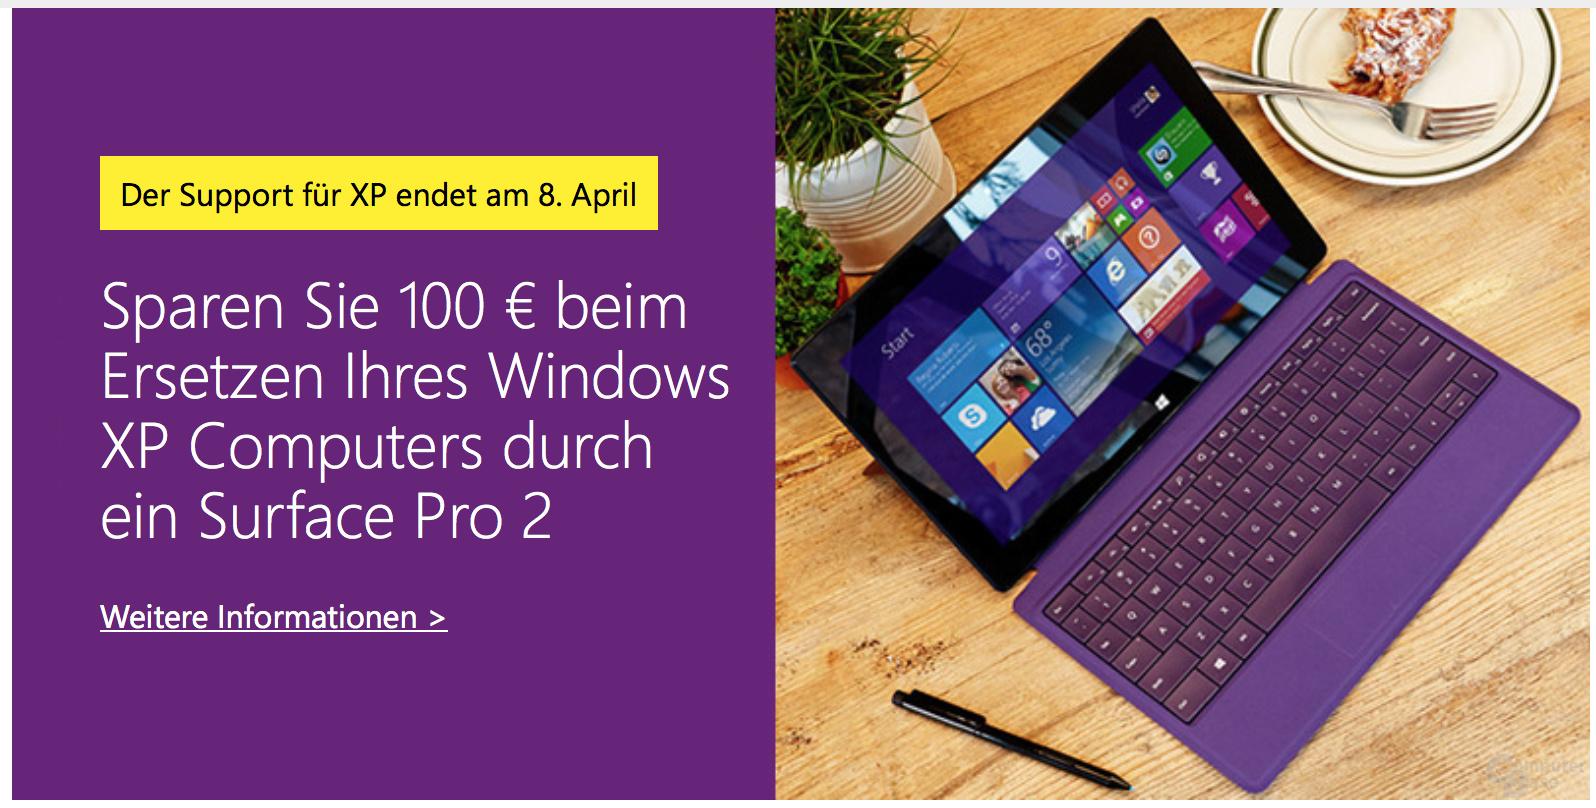 100 Euro Rabatt auf Surface Pro und Surface Pro 2